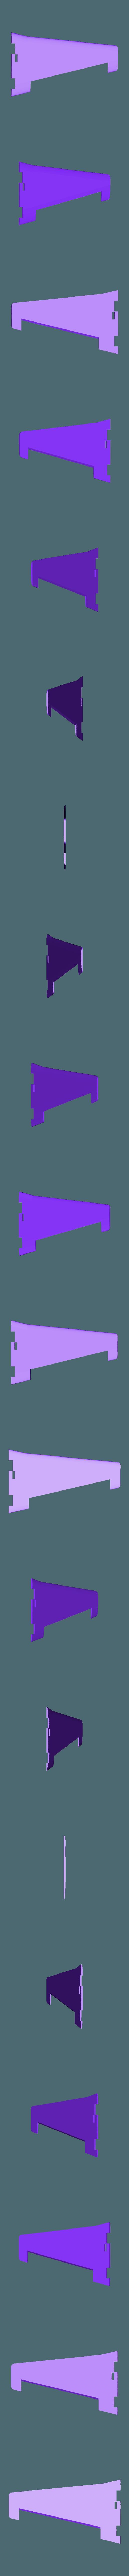 Wing 2 Rev01.STL Download free STL file V1 Release - New RC Plane • 3D printable design, Trikonics